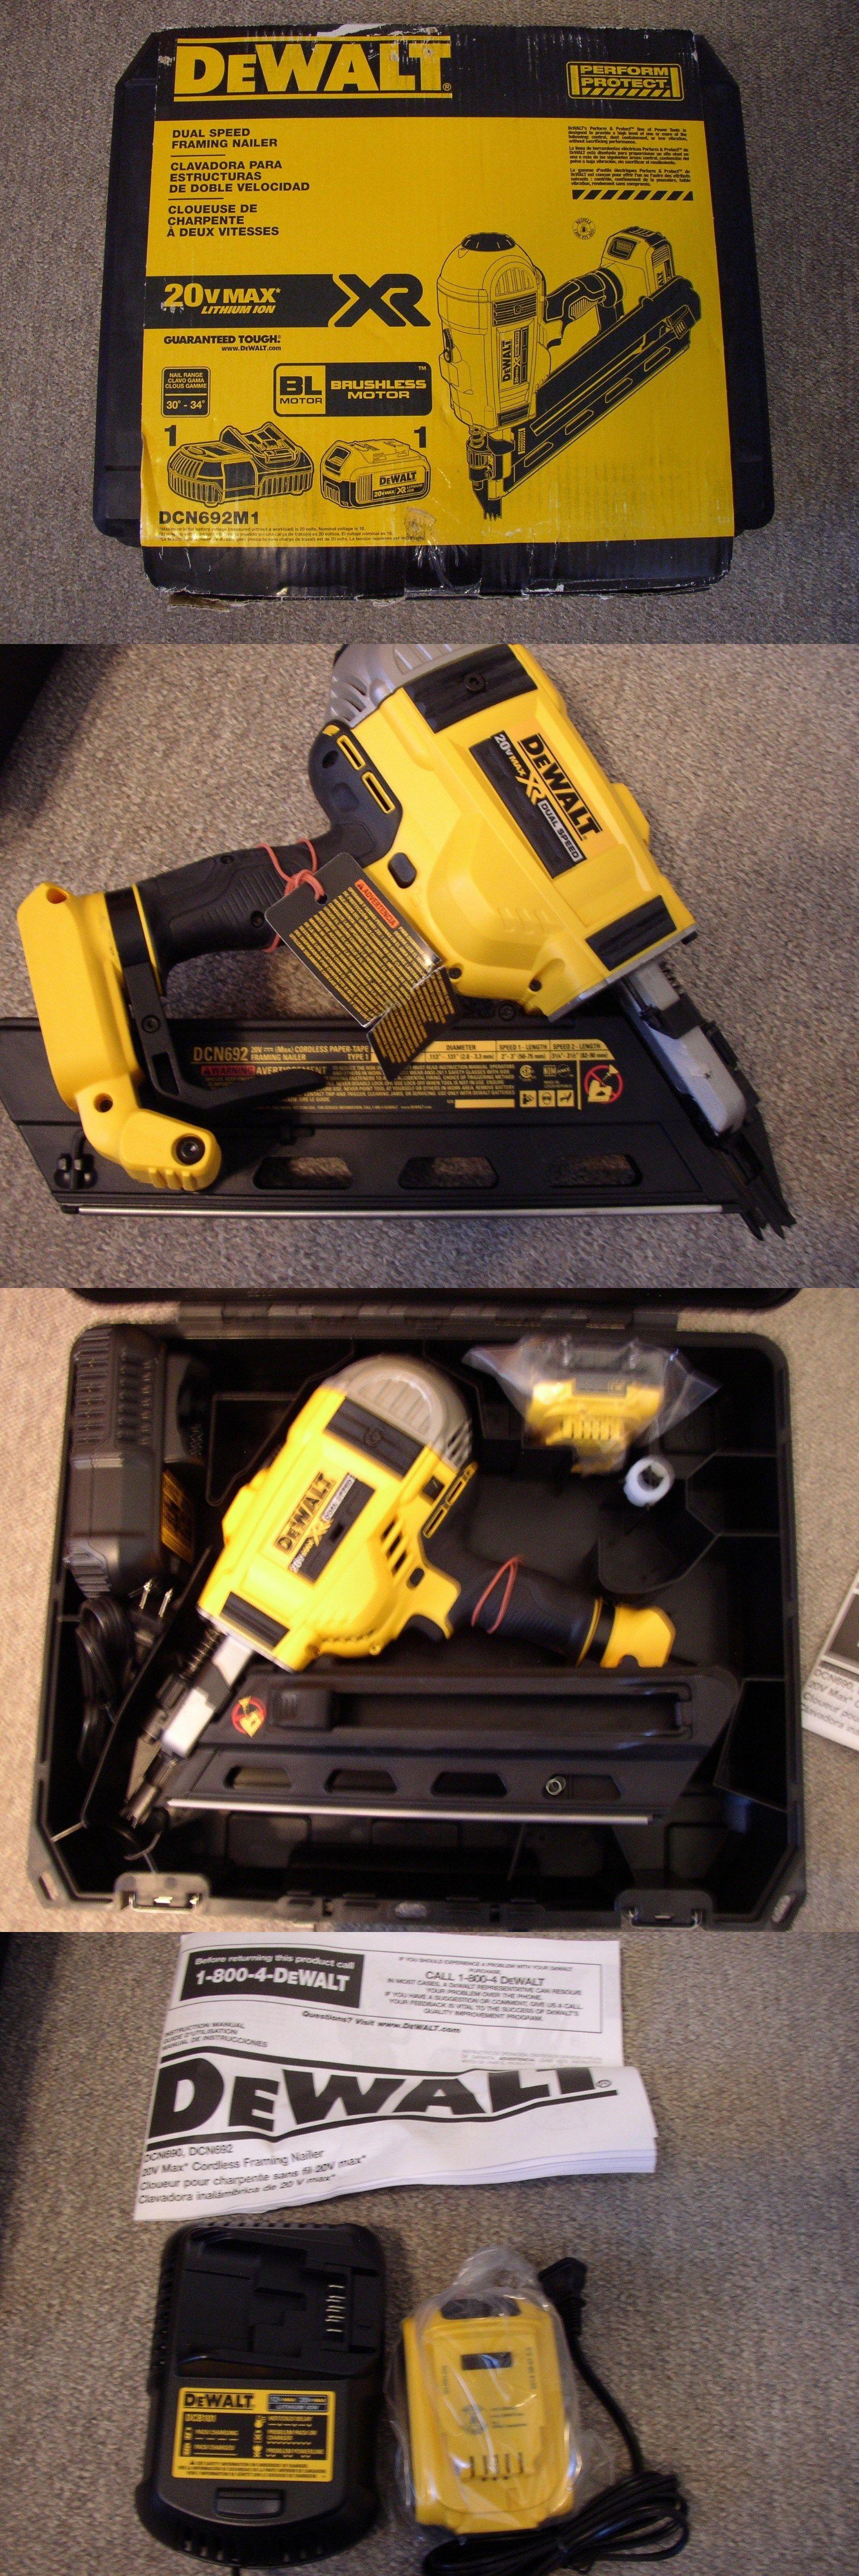 Framing Guns 50378: New Dewalt Framing Nailer Dcn692m1 20 Volt Max ...